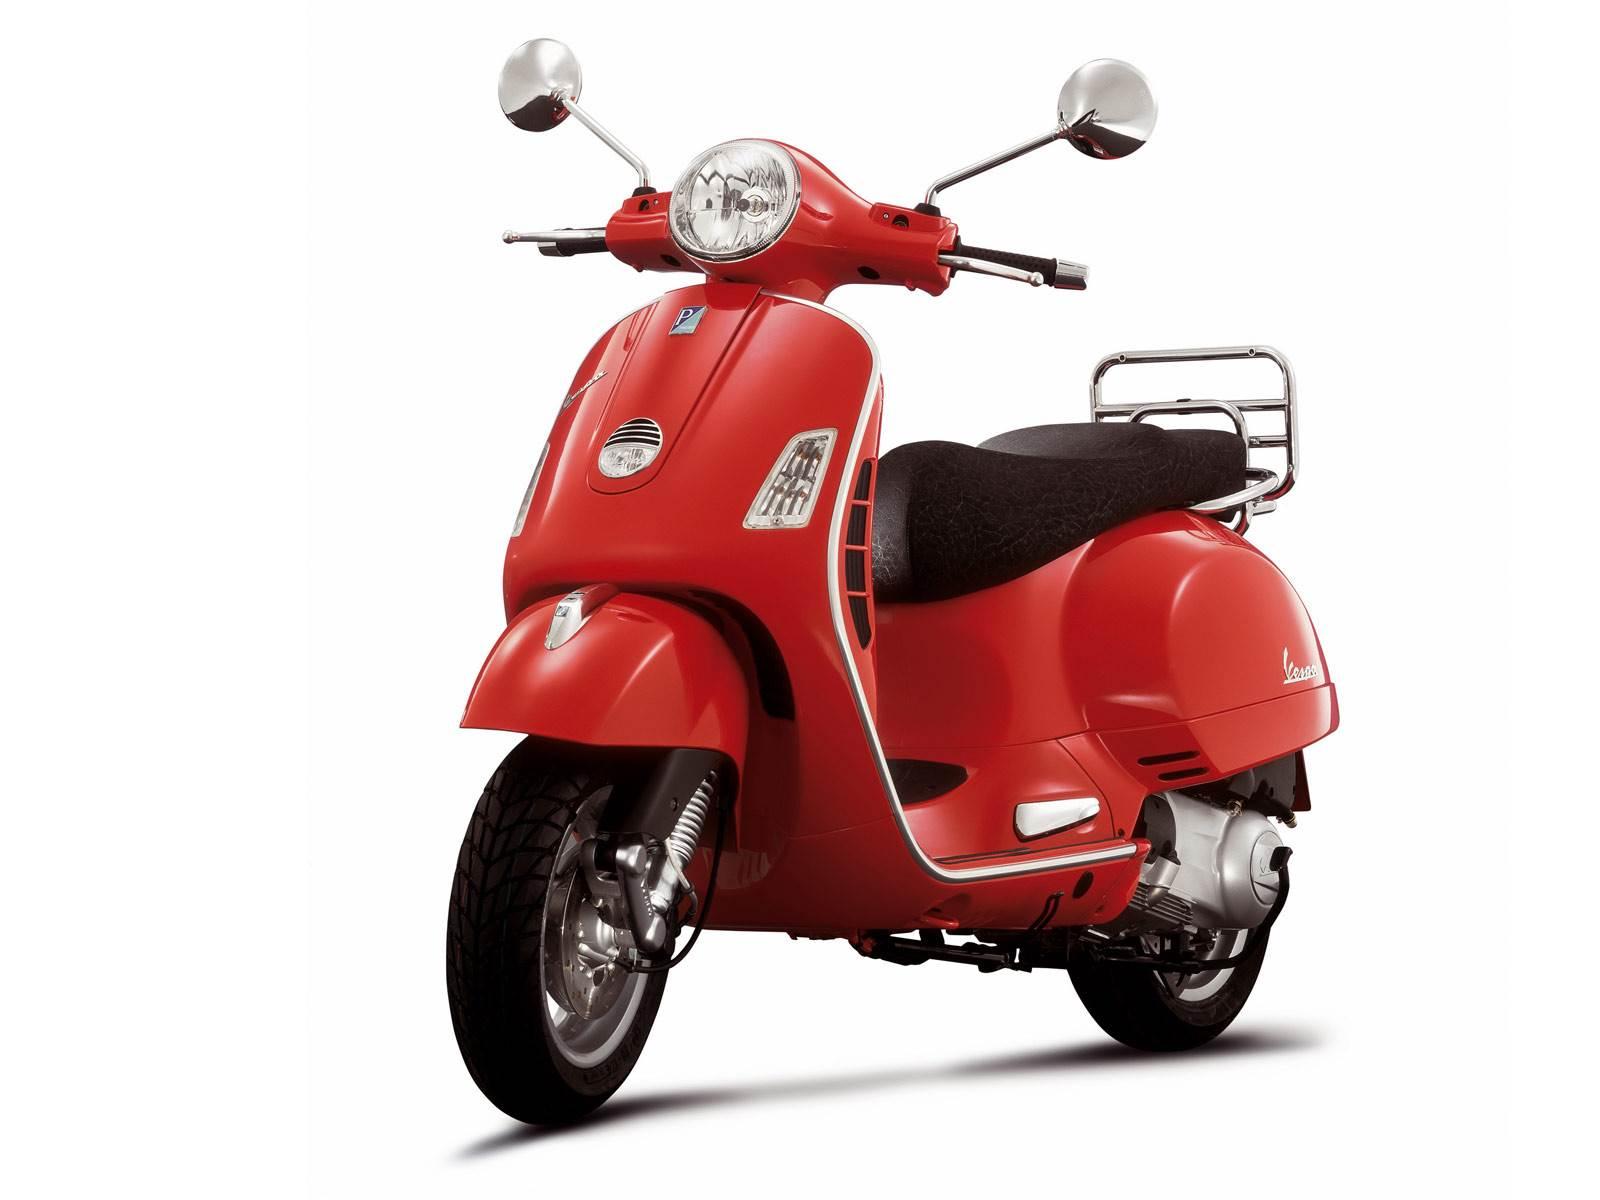 Vespa working on mass market scooter